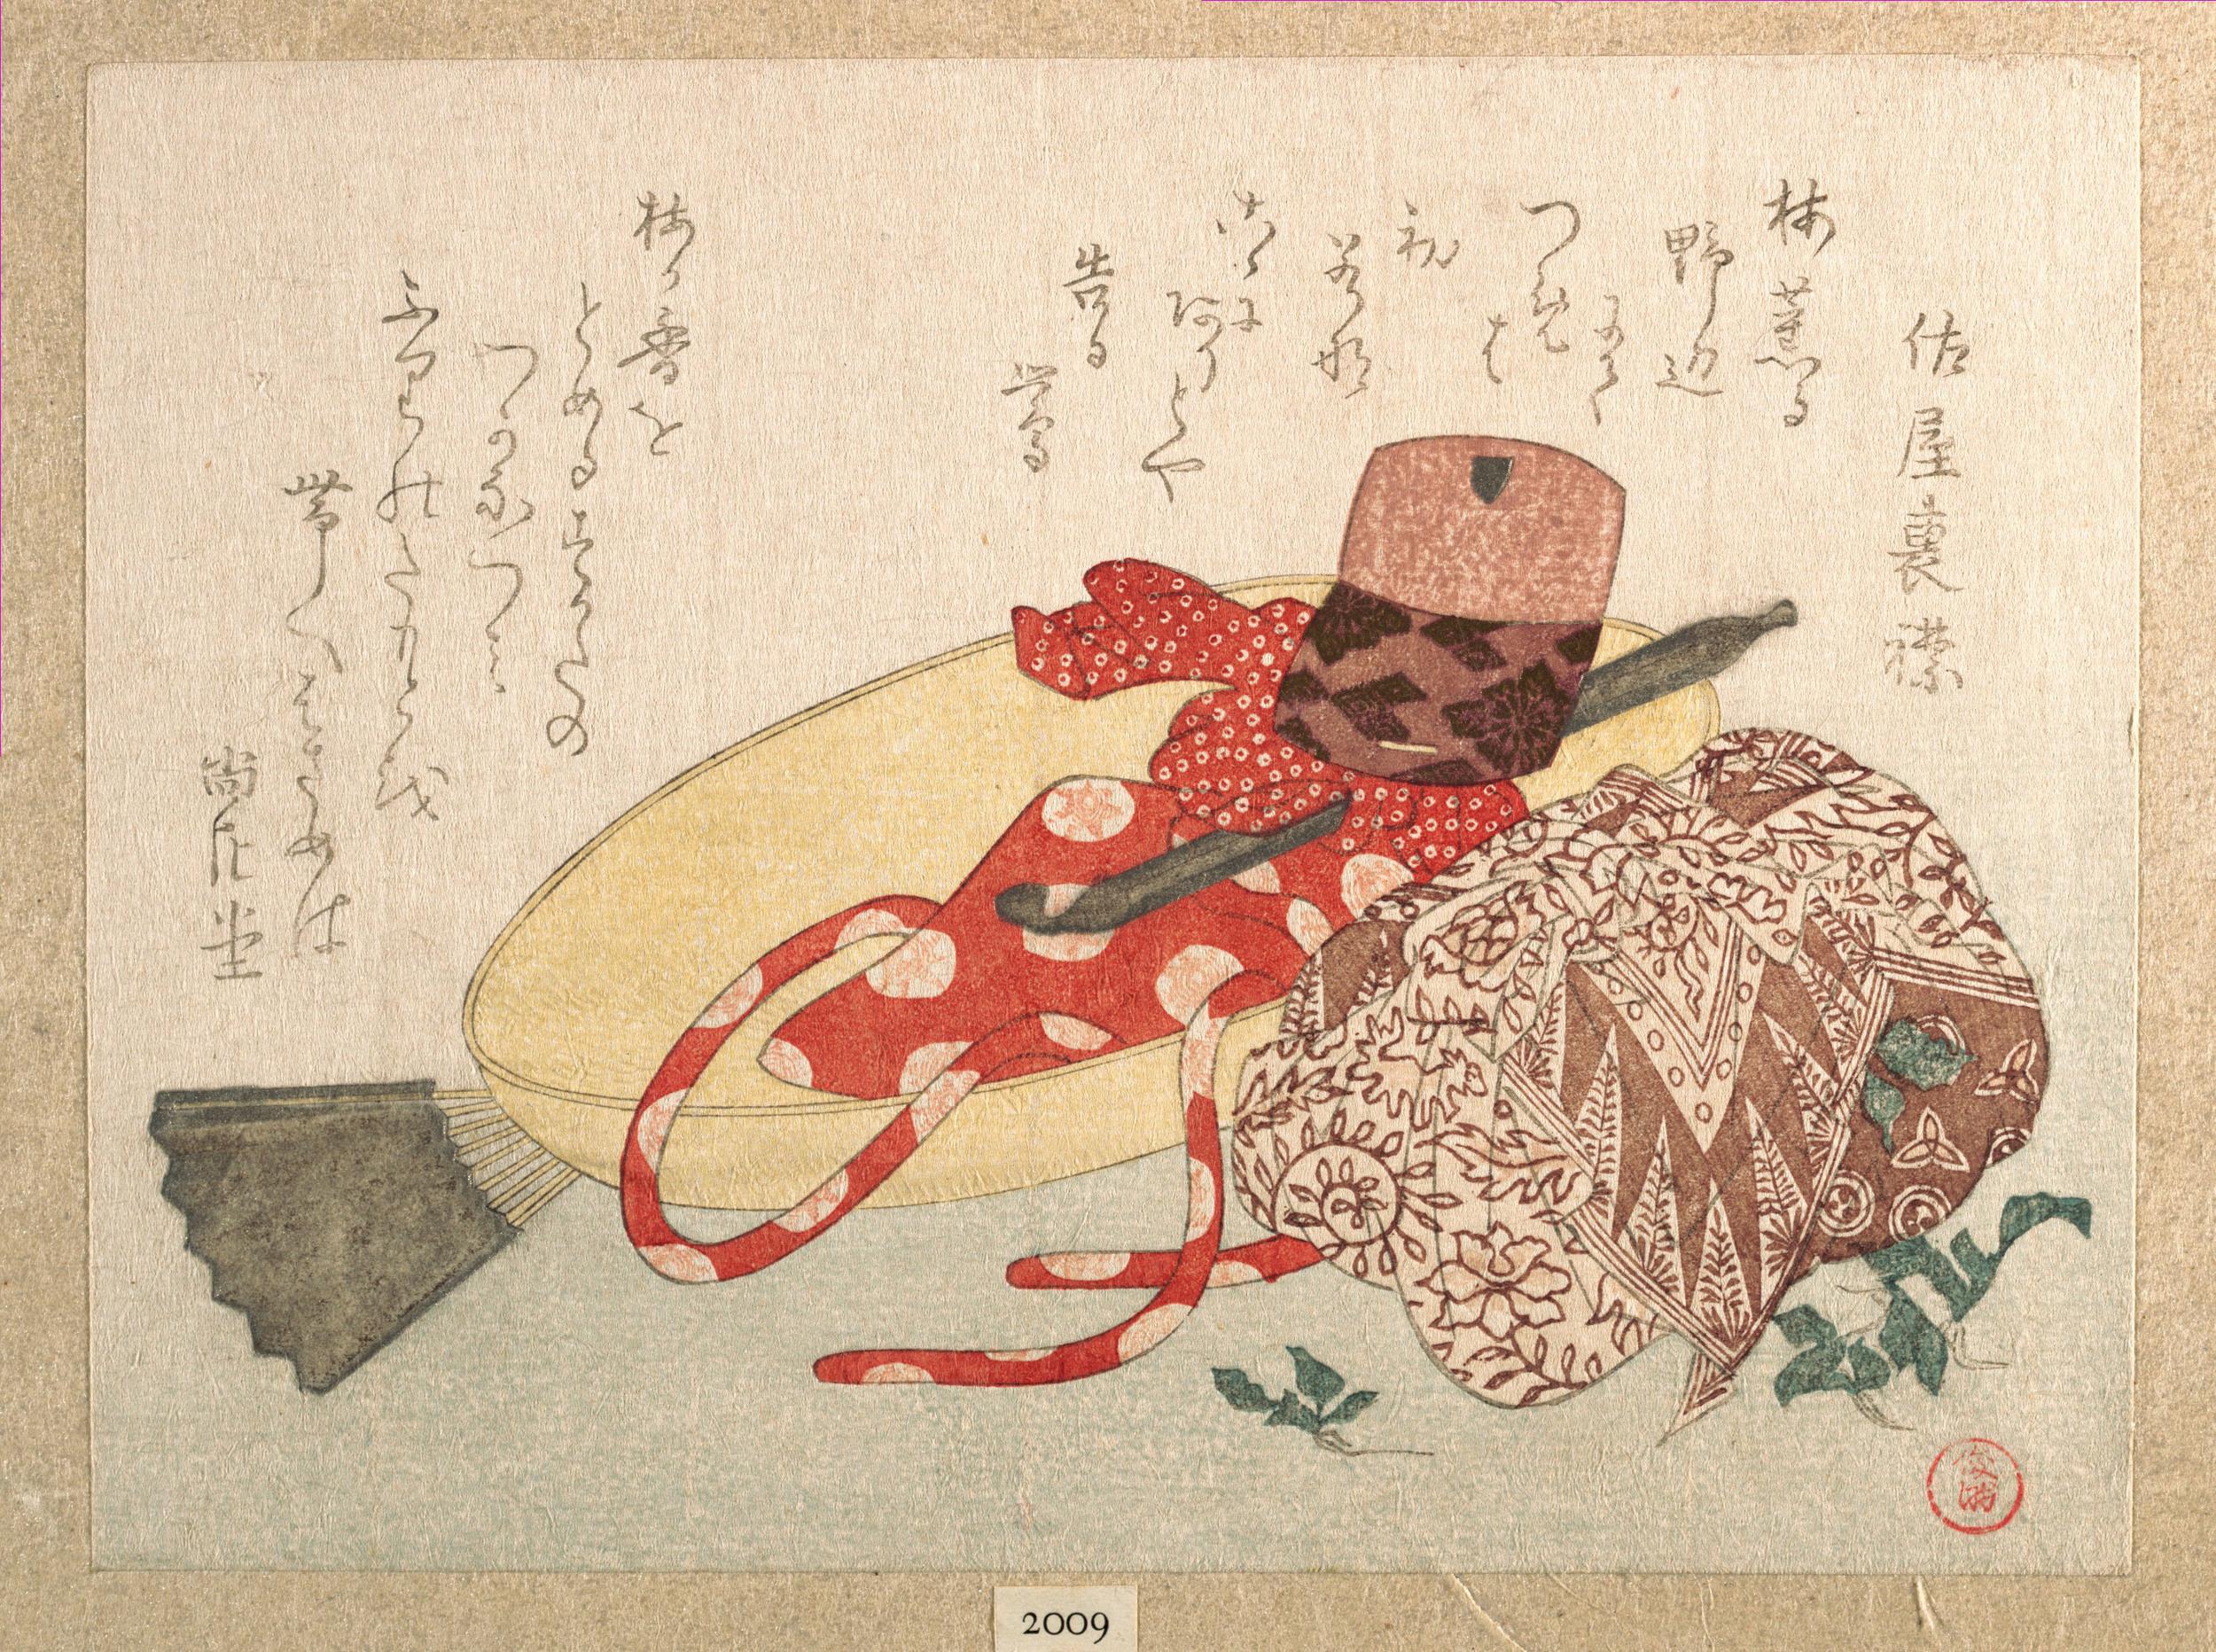 Kubo Shunman,  Picnic Outfit  (1800 circa).